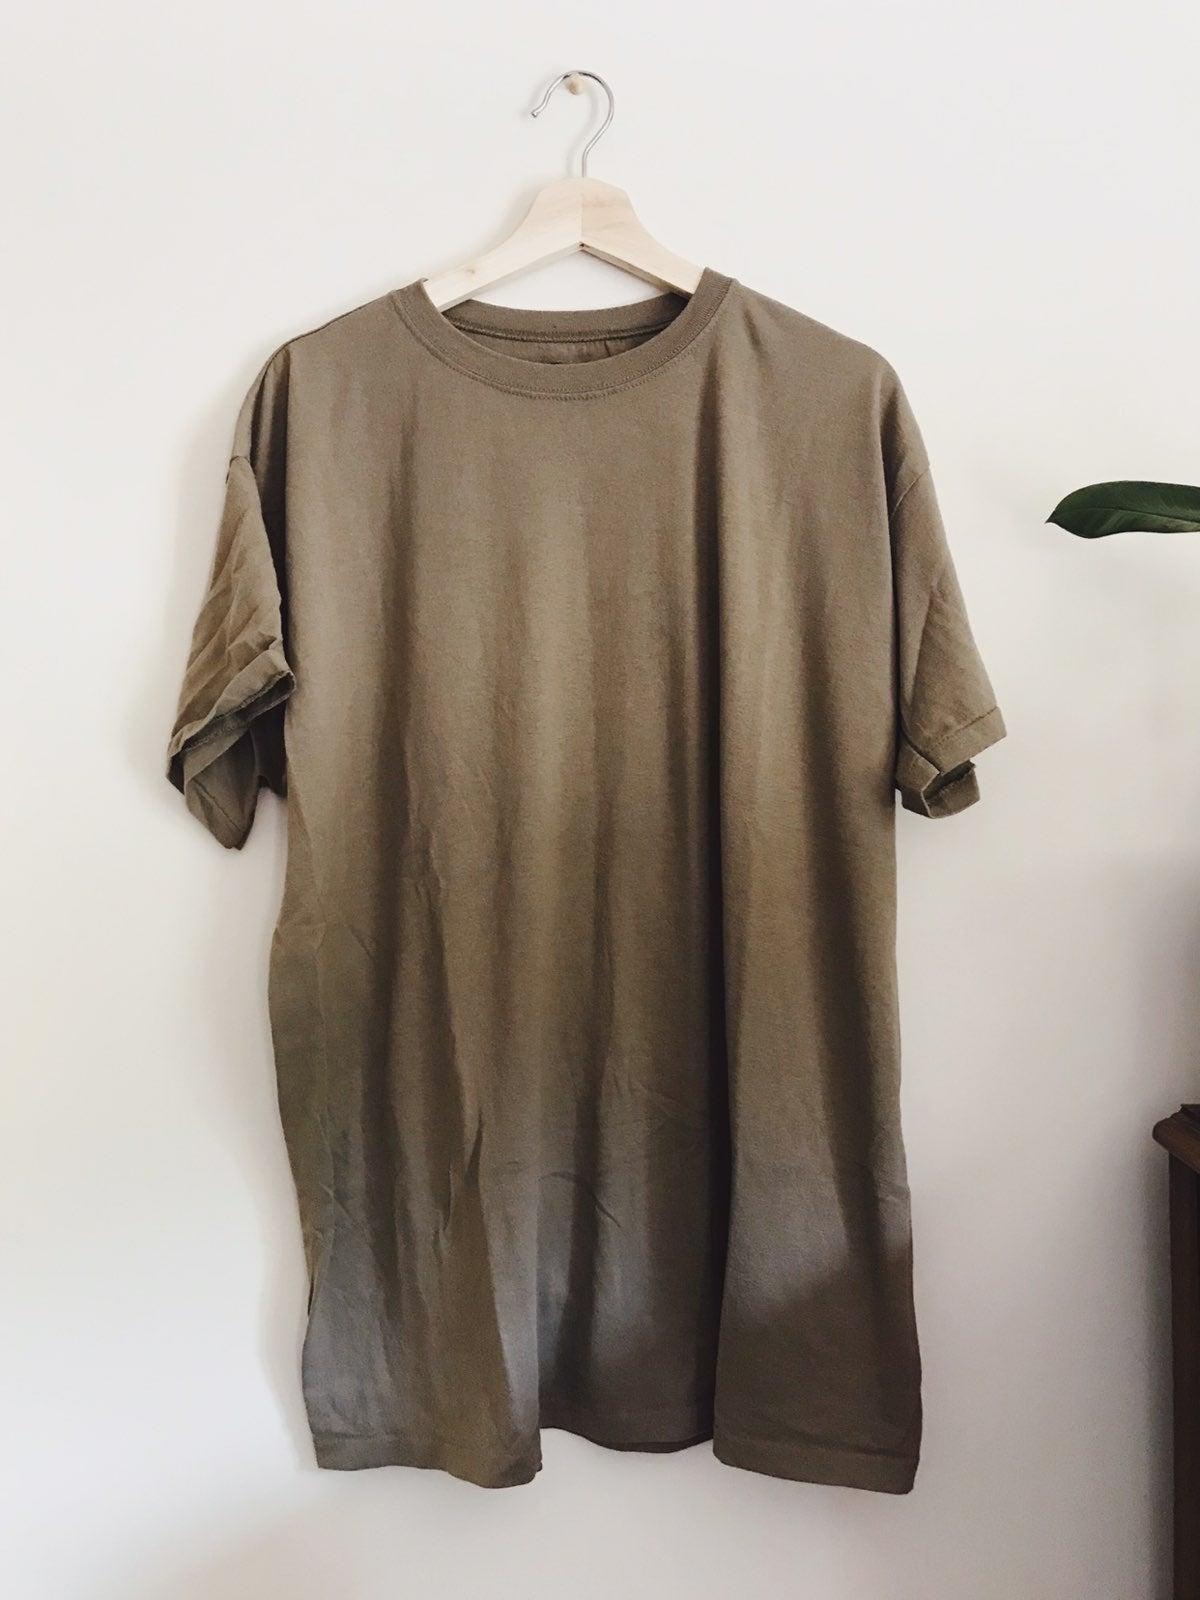 Military T-shirt Tan